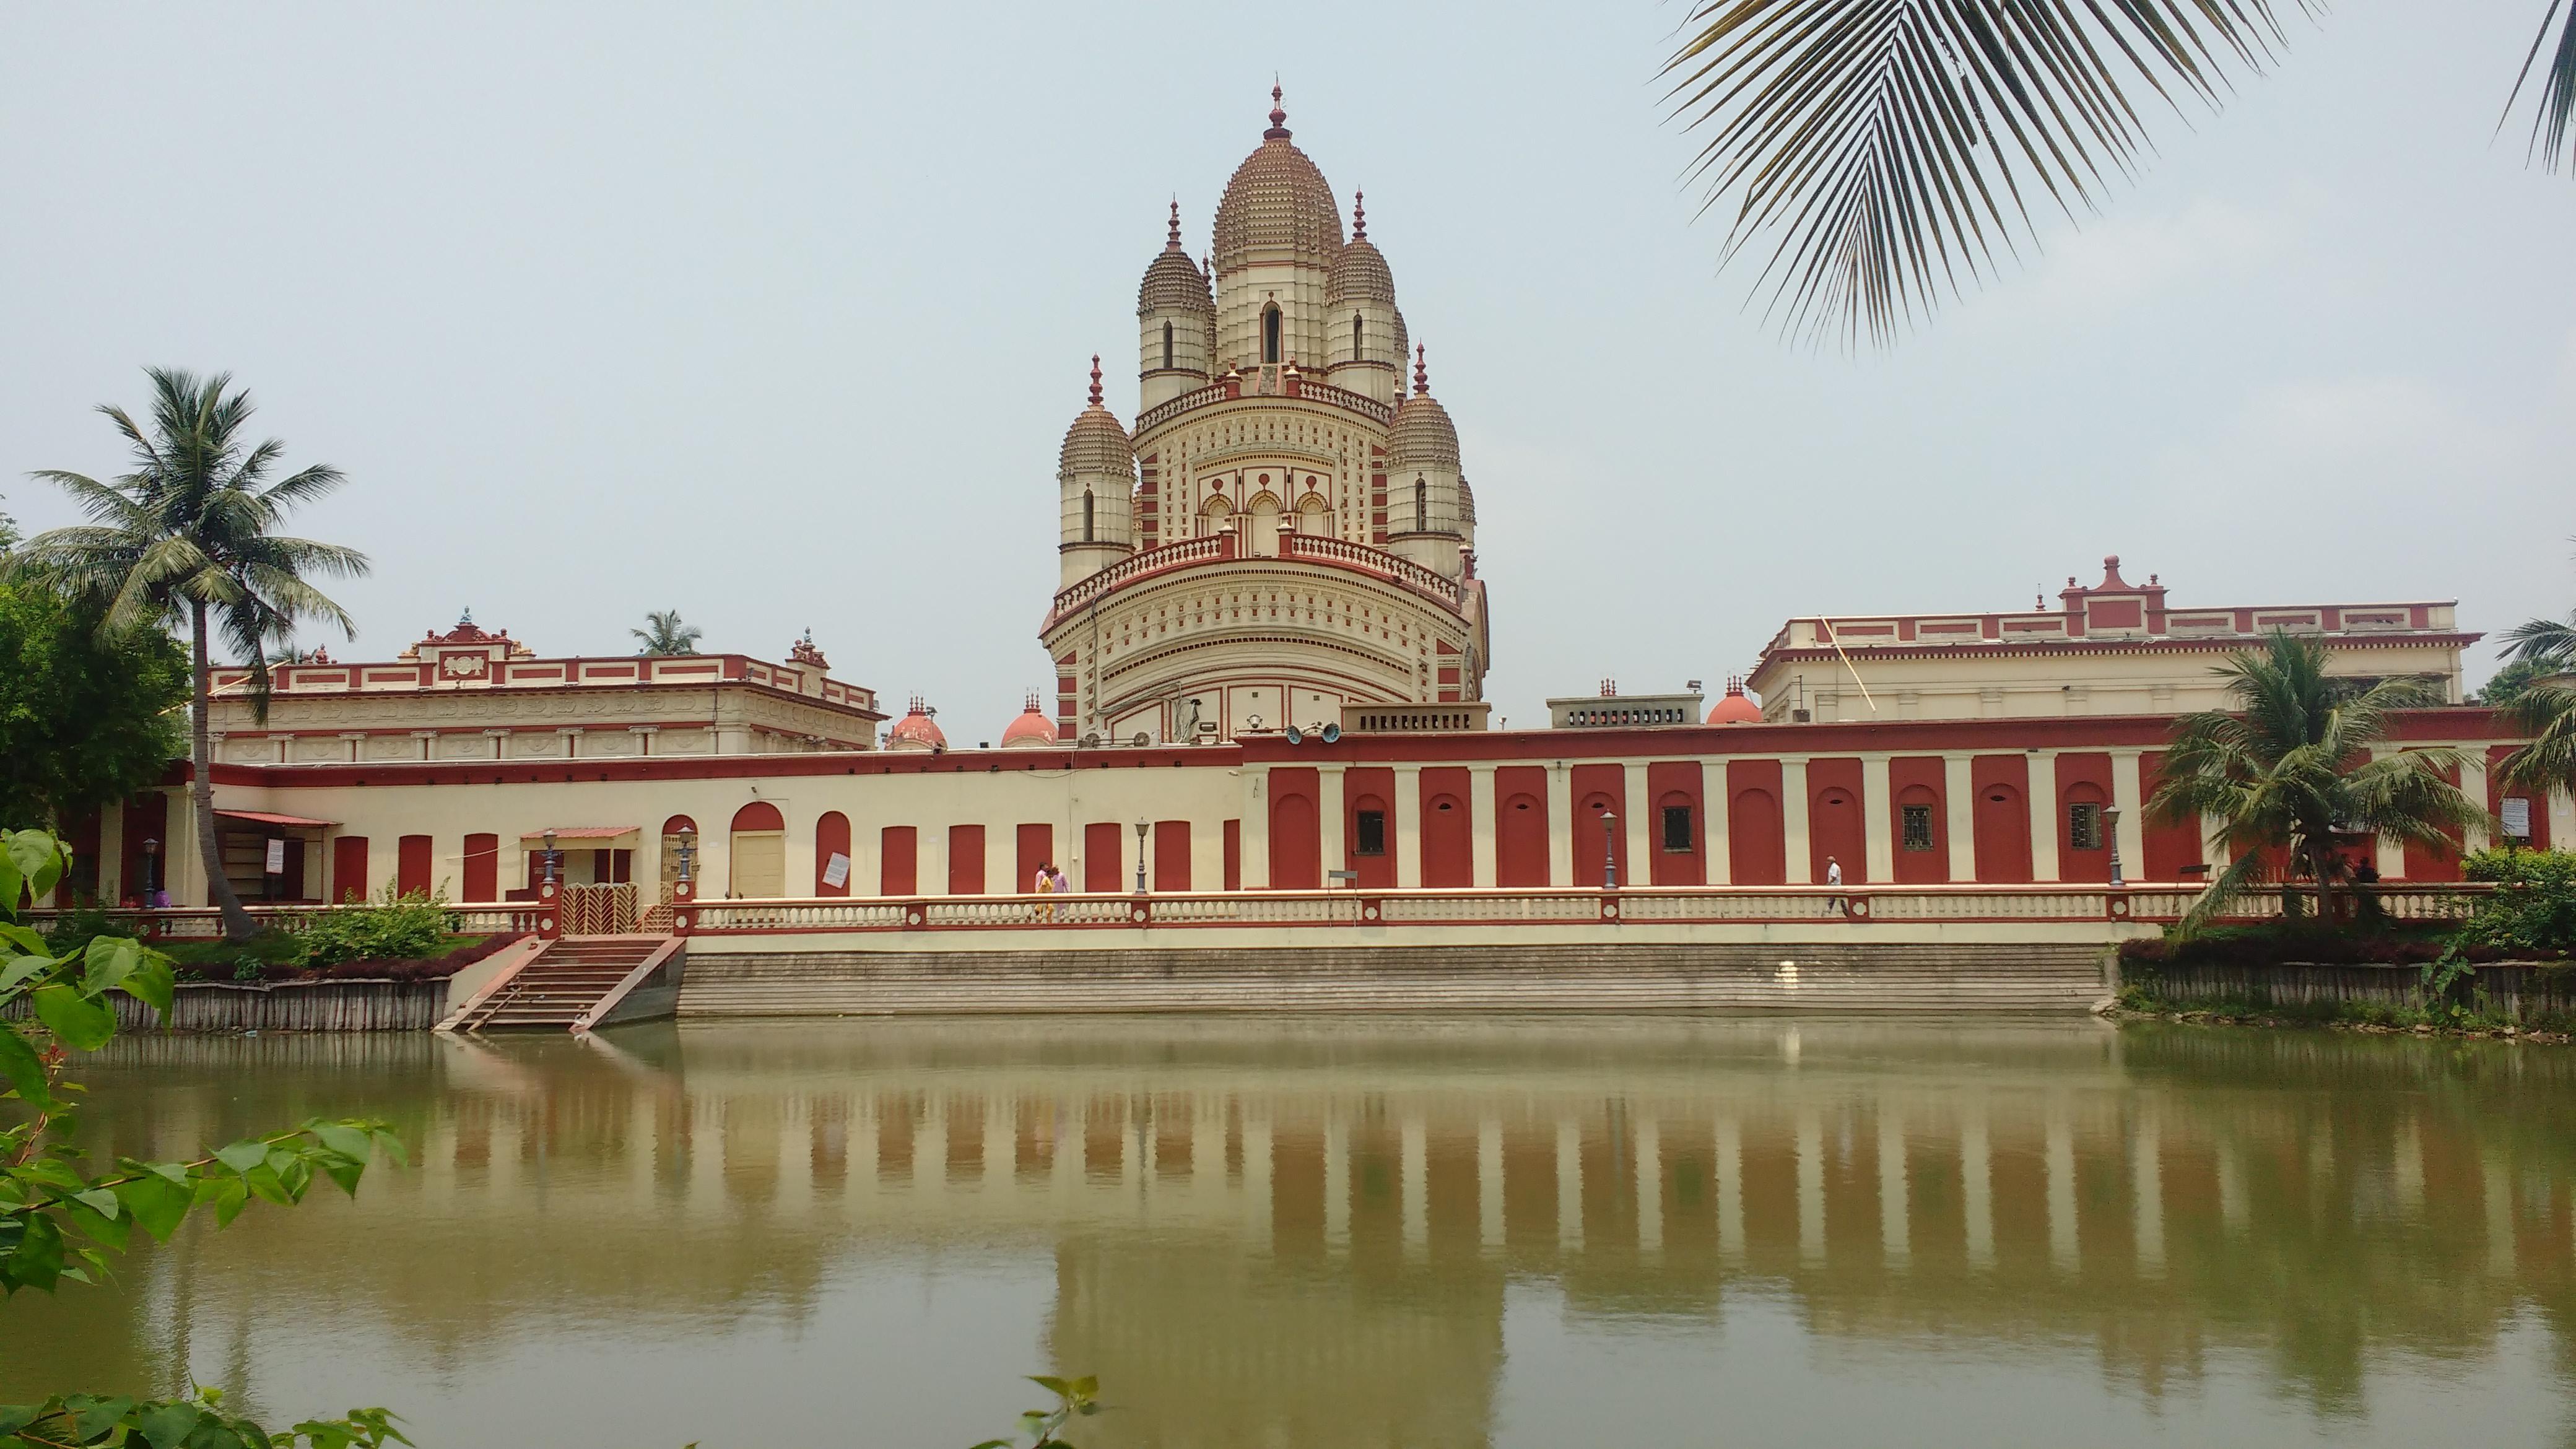 Preserving faith at the Dakshineshwar Kali temple